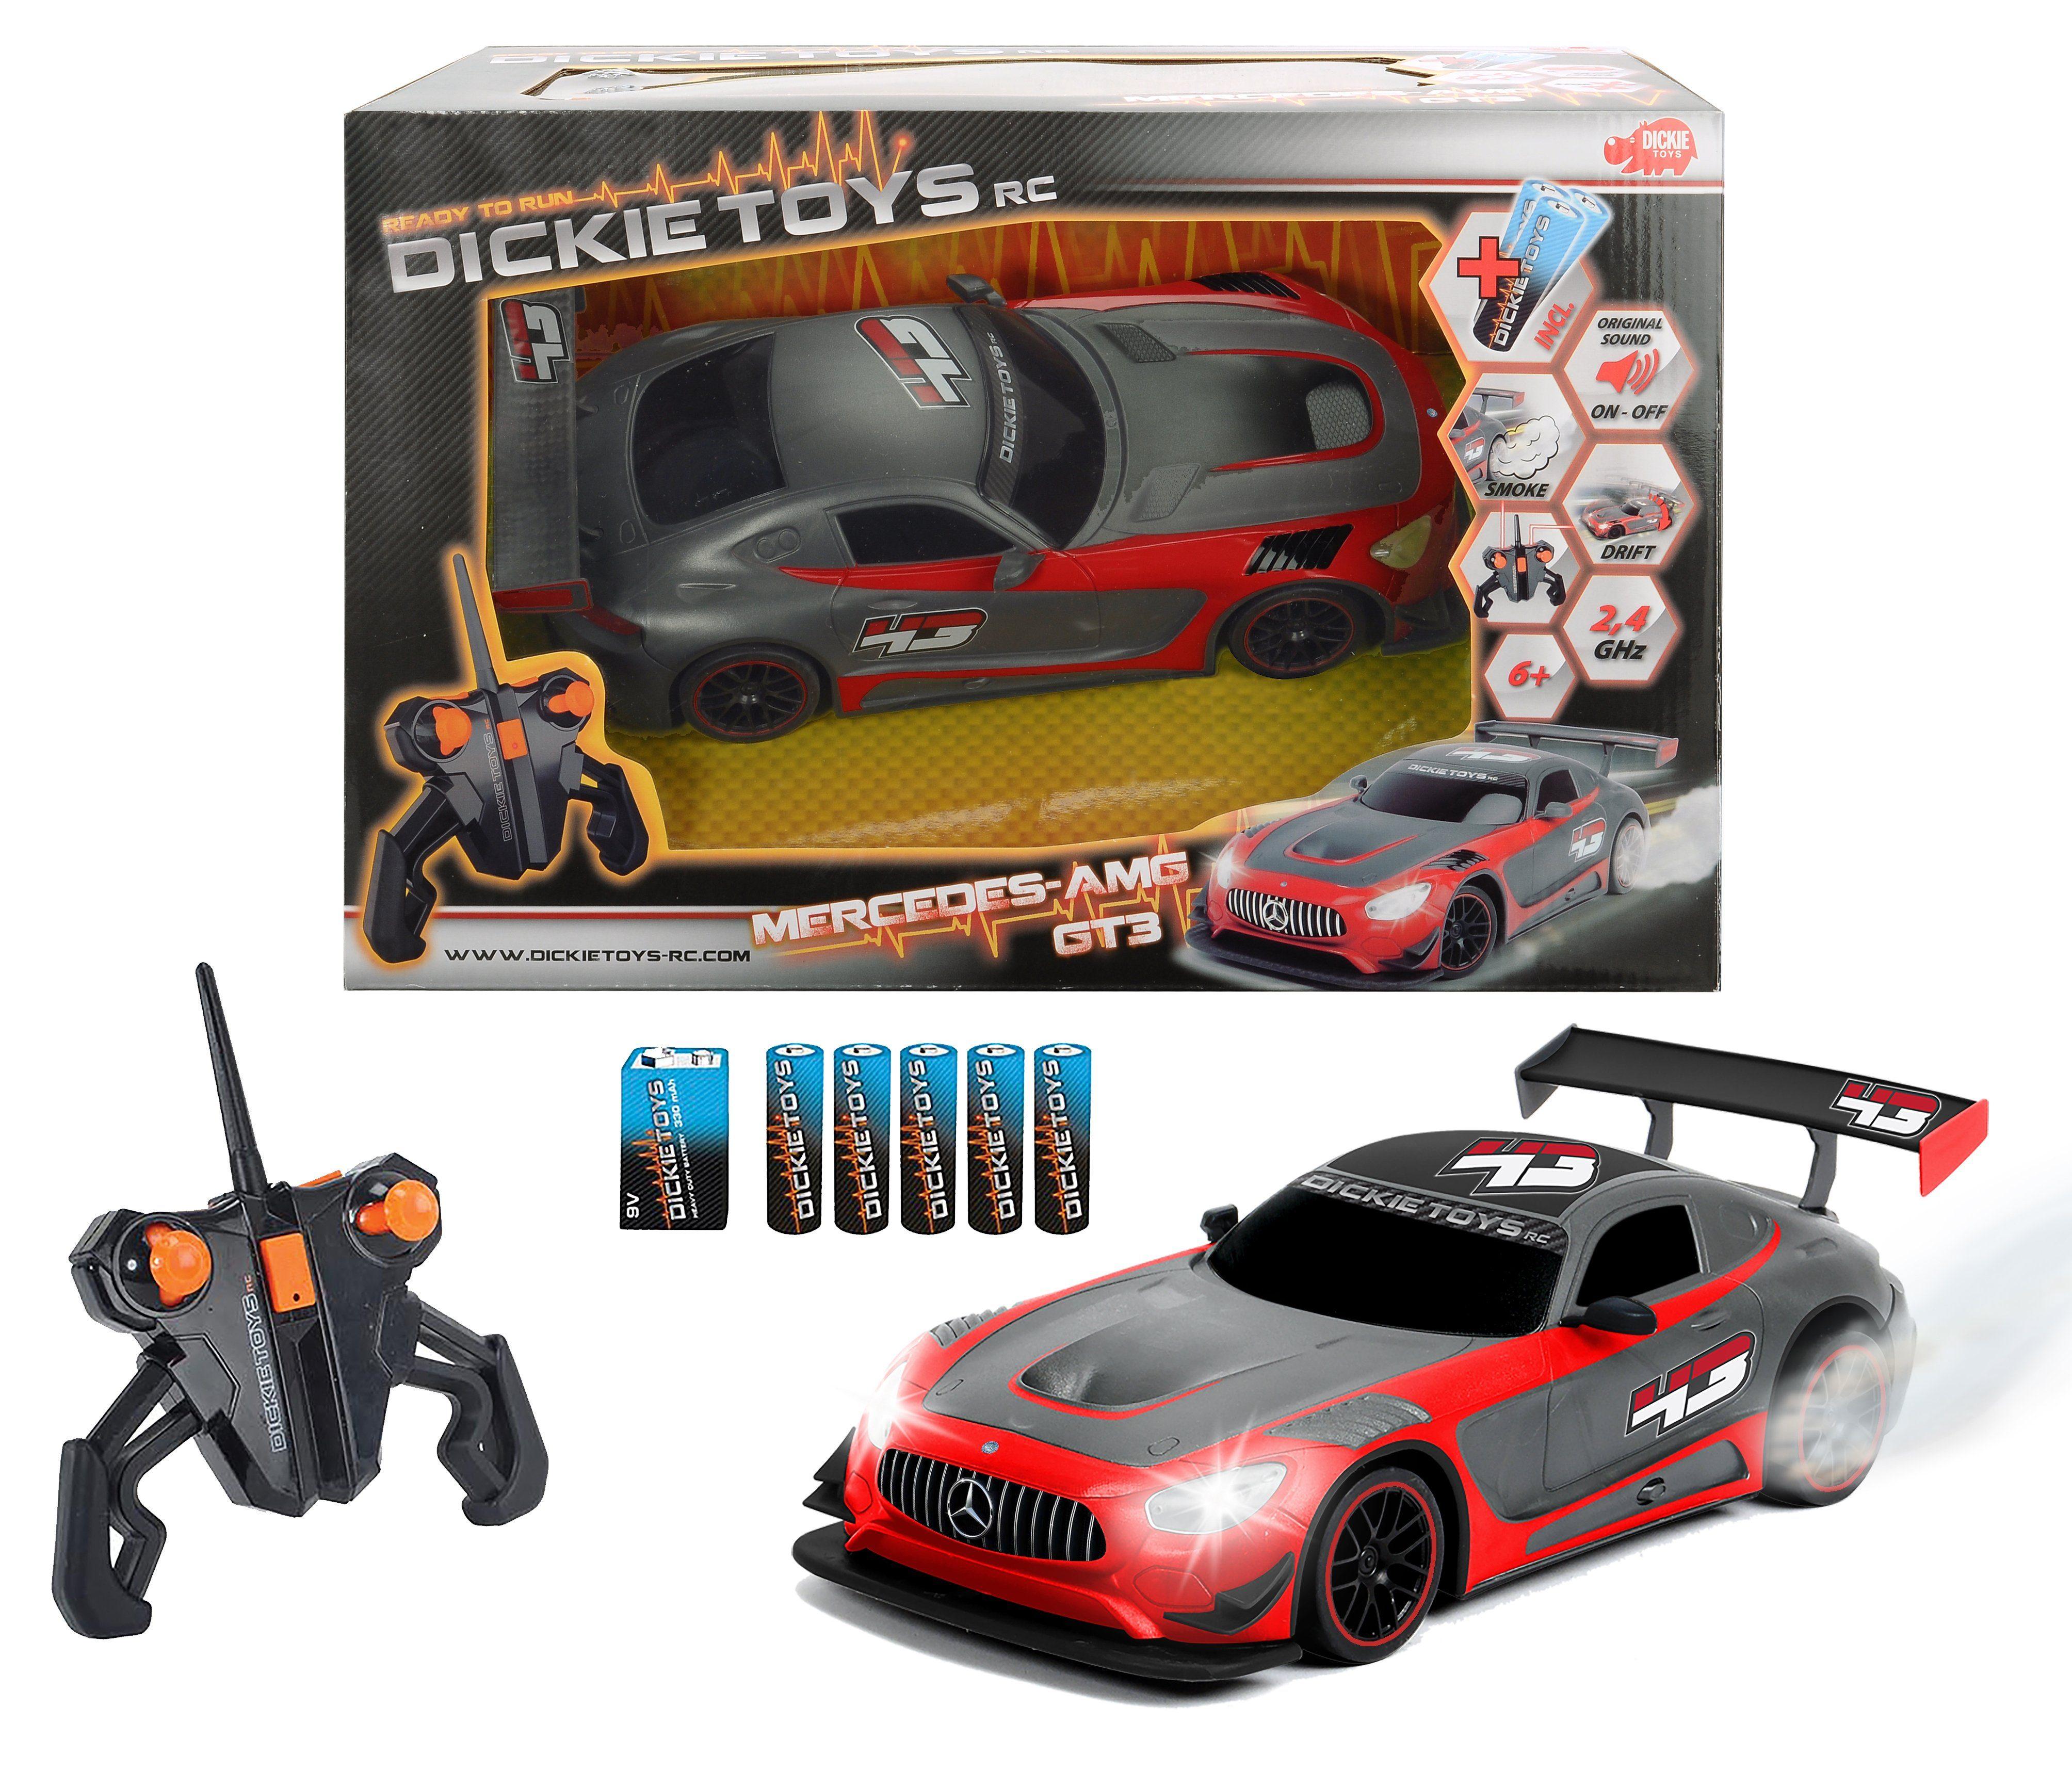 Dickie Toys RC Komplett Set, »Mercedes AMG GT3 2,4 GHz 1:16 Grau«